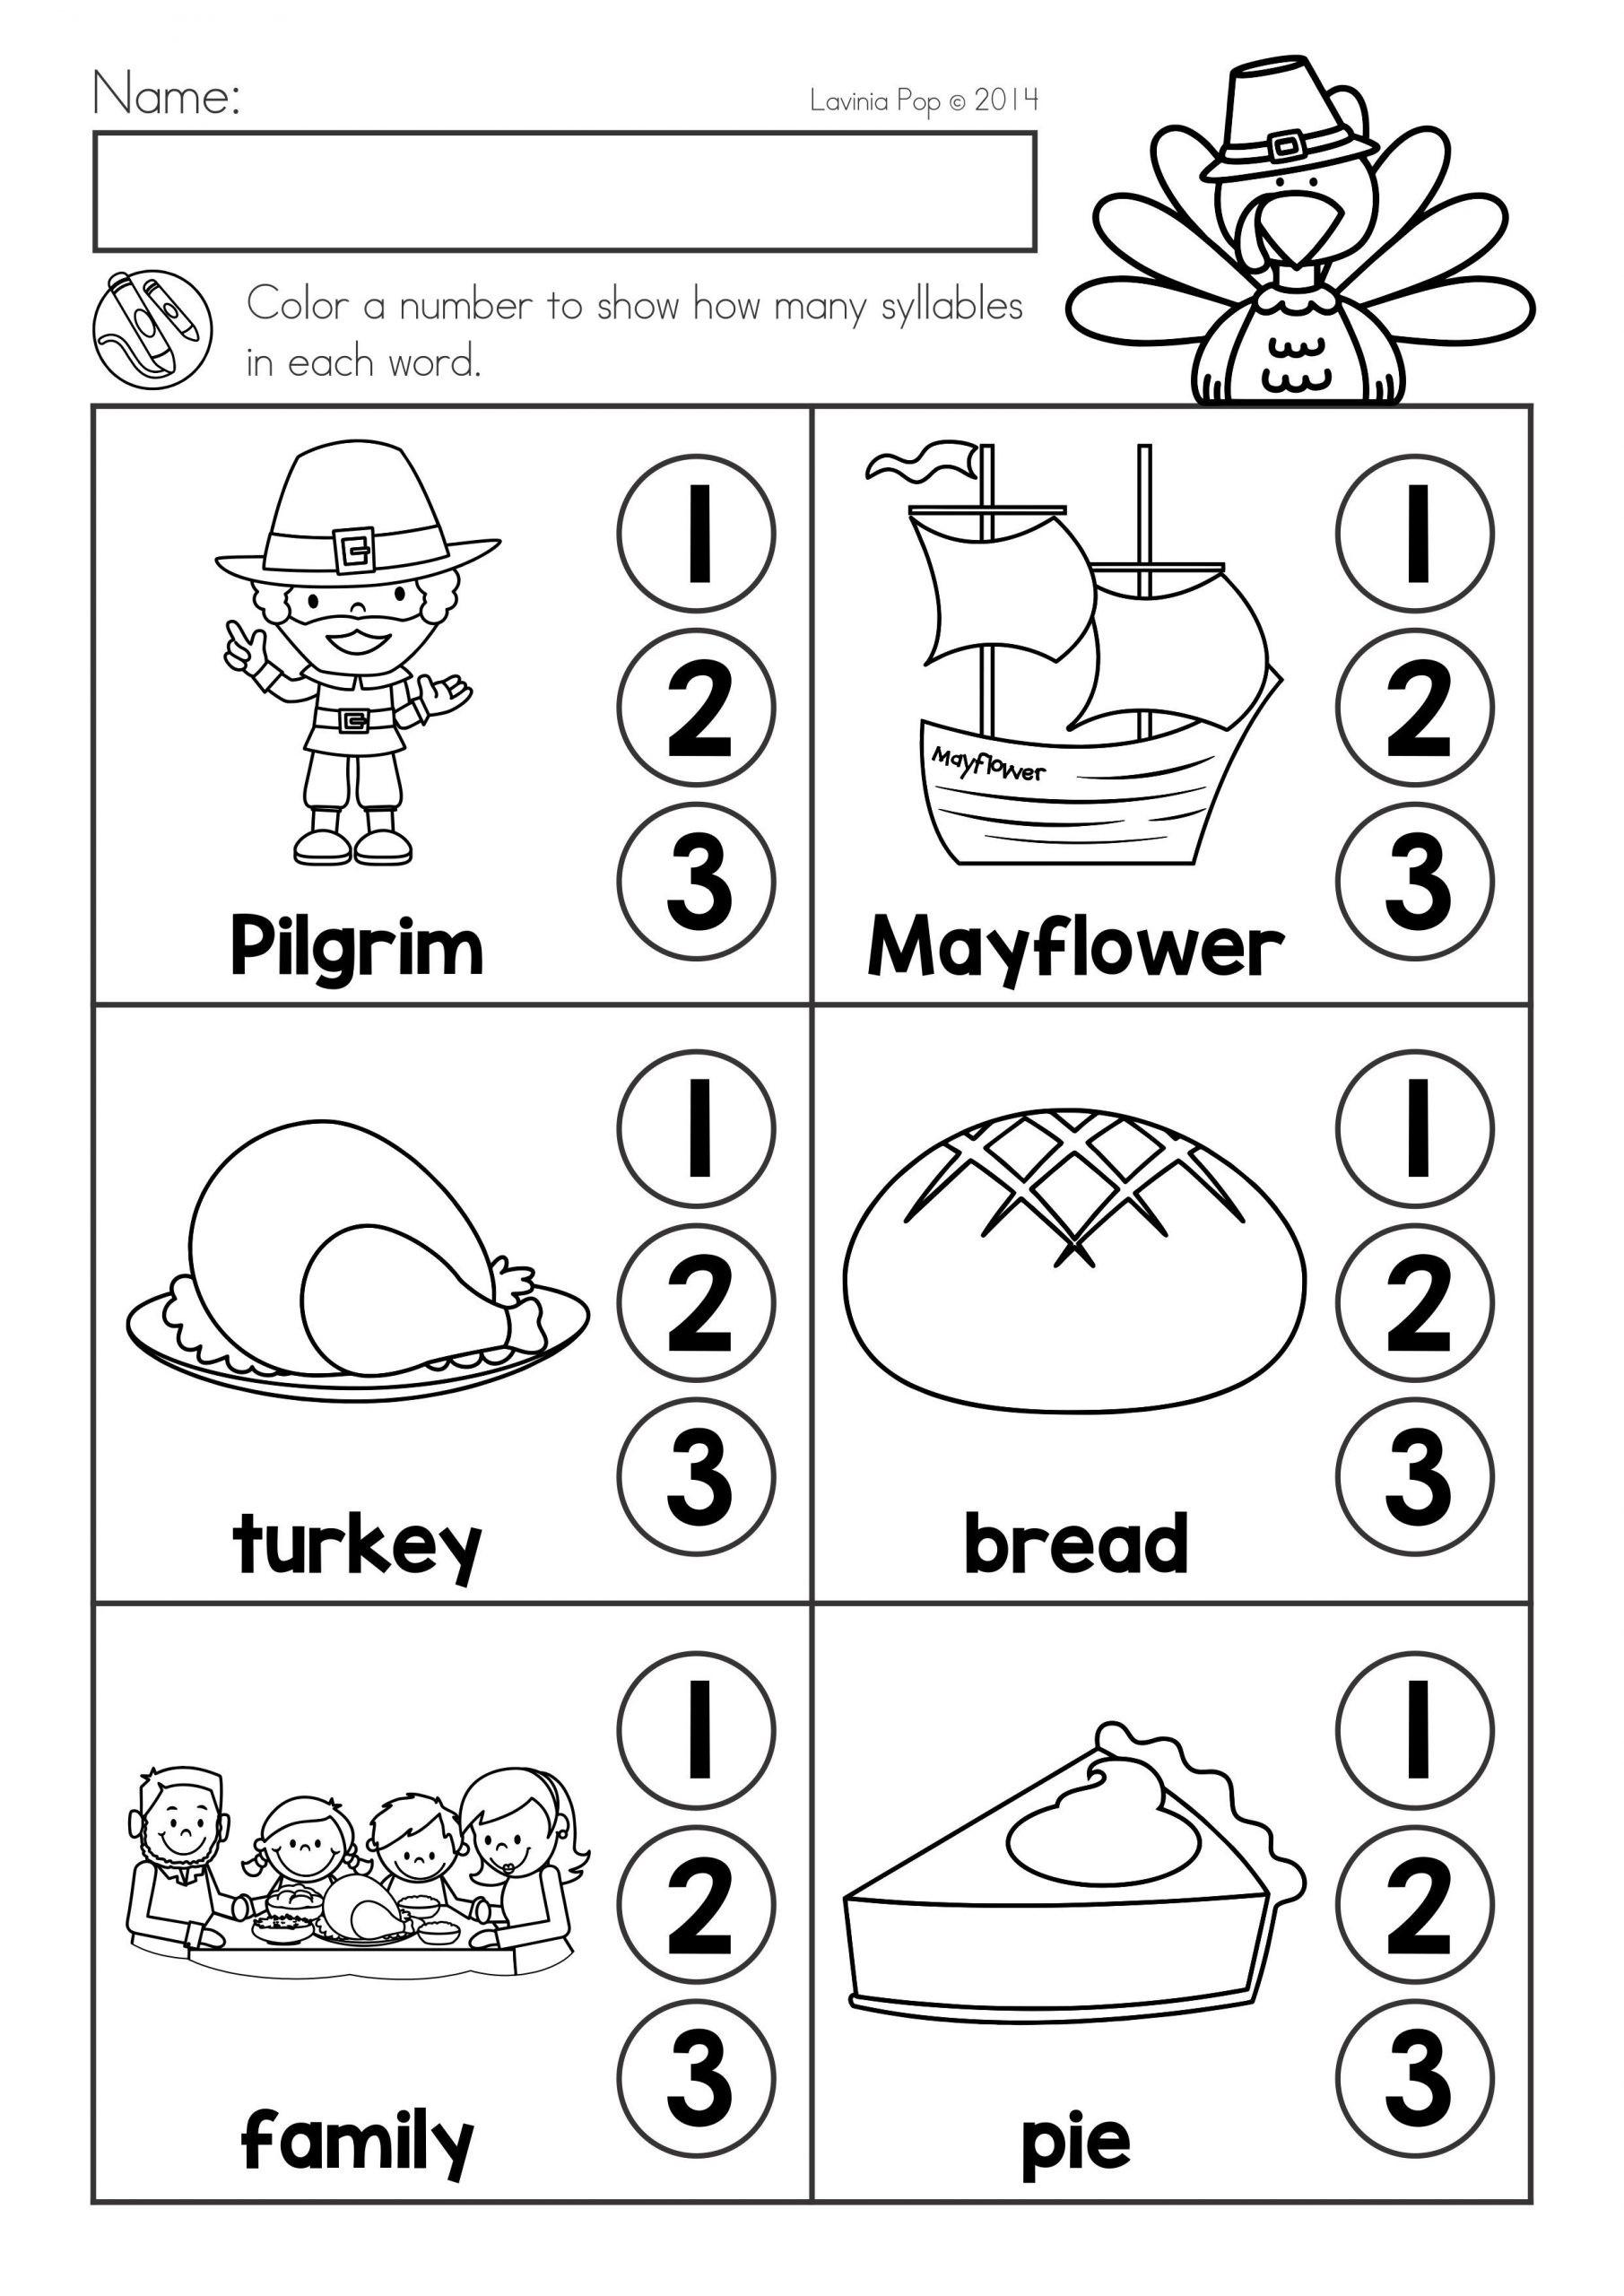 Syllables Worksheet for Kindergarten 20 Syllable Worksheet for Kindergarten